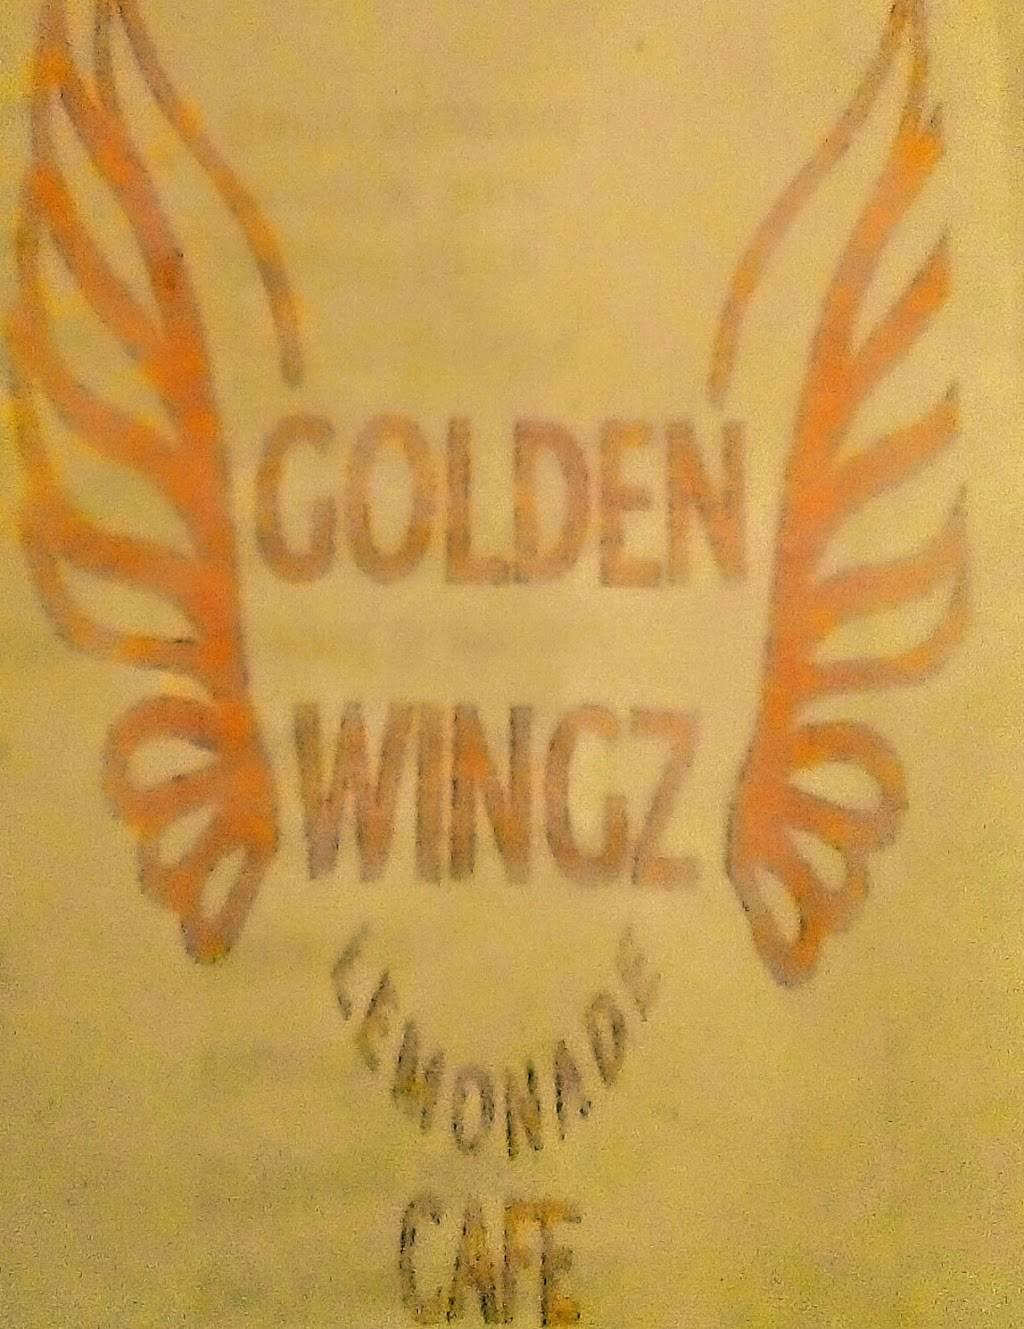 Golden Wingz | restaurant | 1530 Merriman Rd, Westland, MI 48186, USA | 7348587543 OR +1 734-858-7543